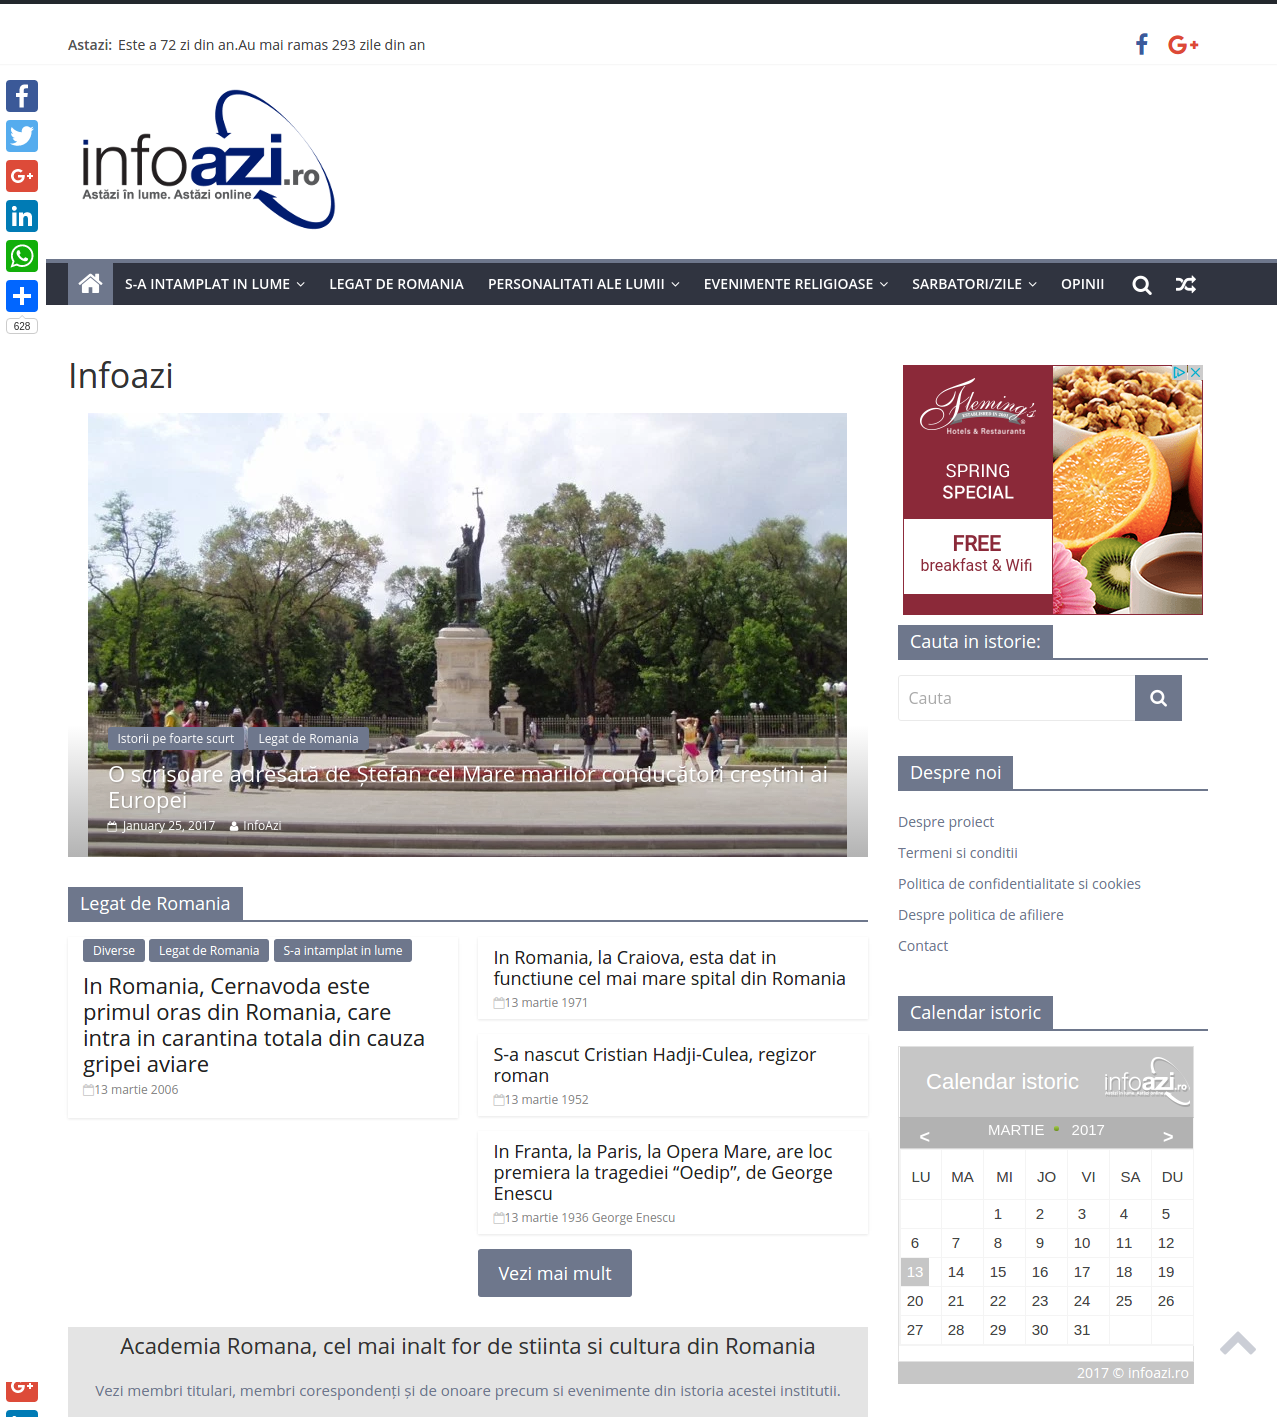 infoazi.ro